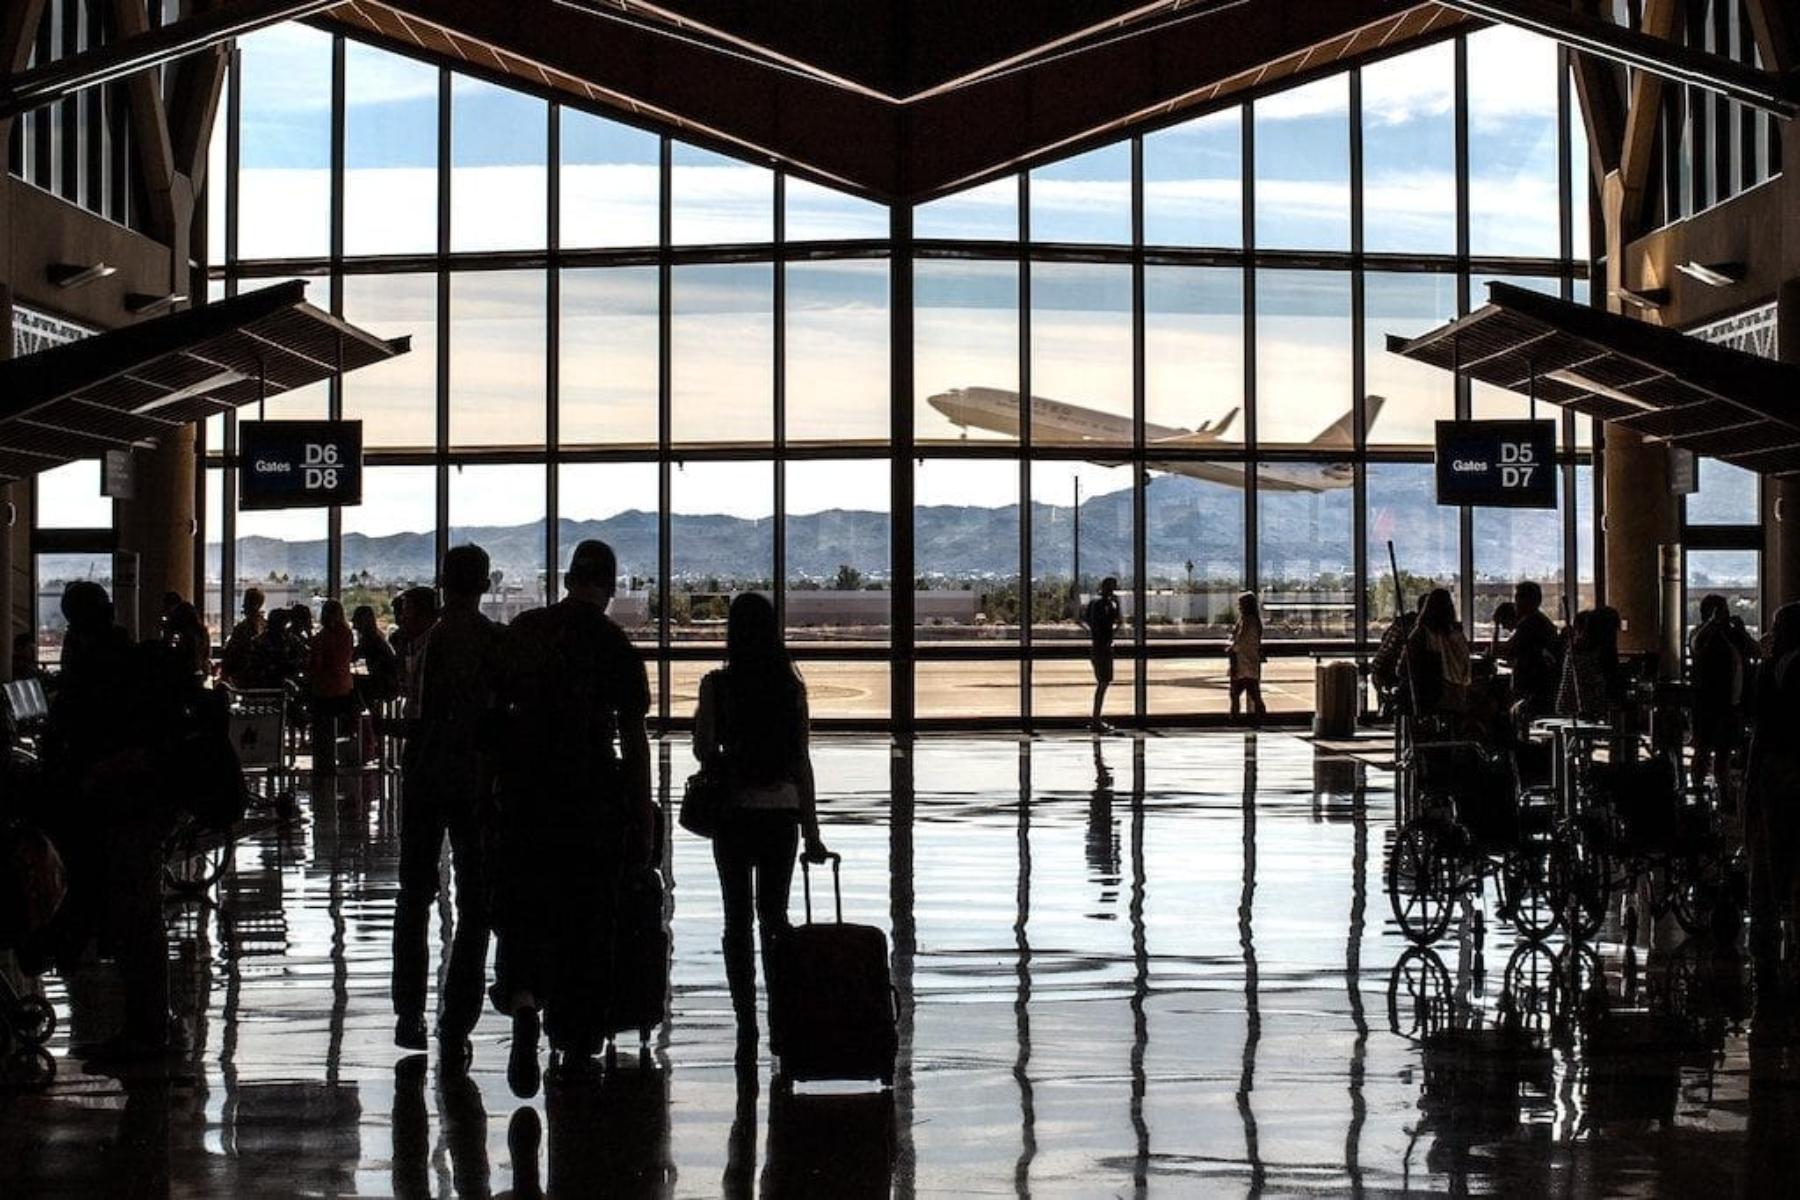 Spotnana: Η 1η ανοιχτή πλατφόρμα καινοτομίας Travel ξεκινά με $41εκατ. χρηματοδότηση